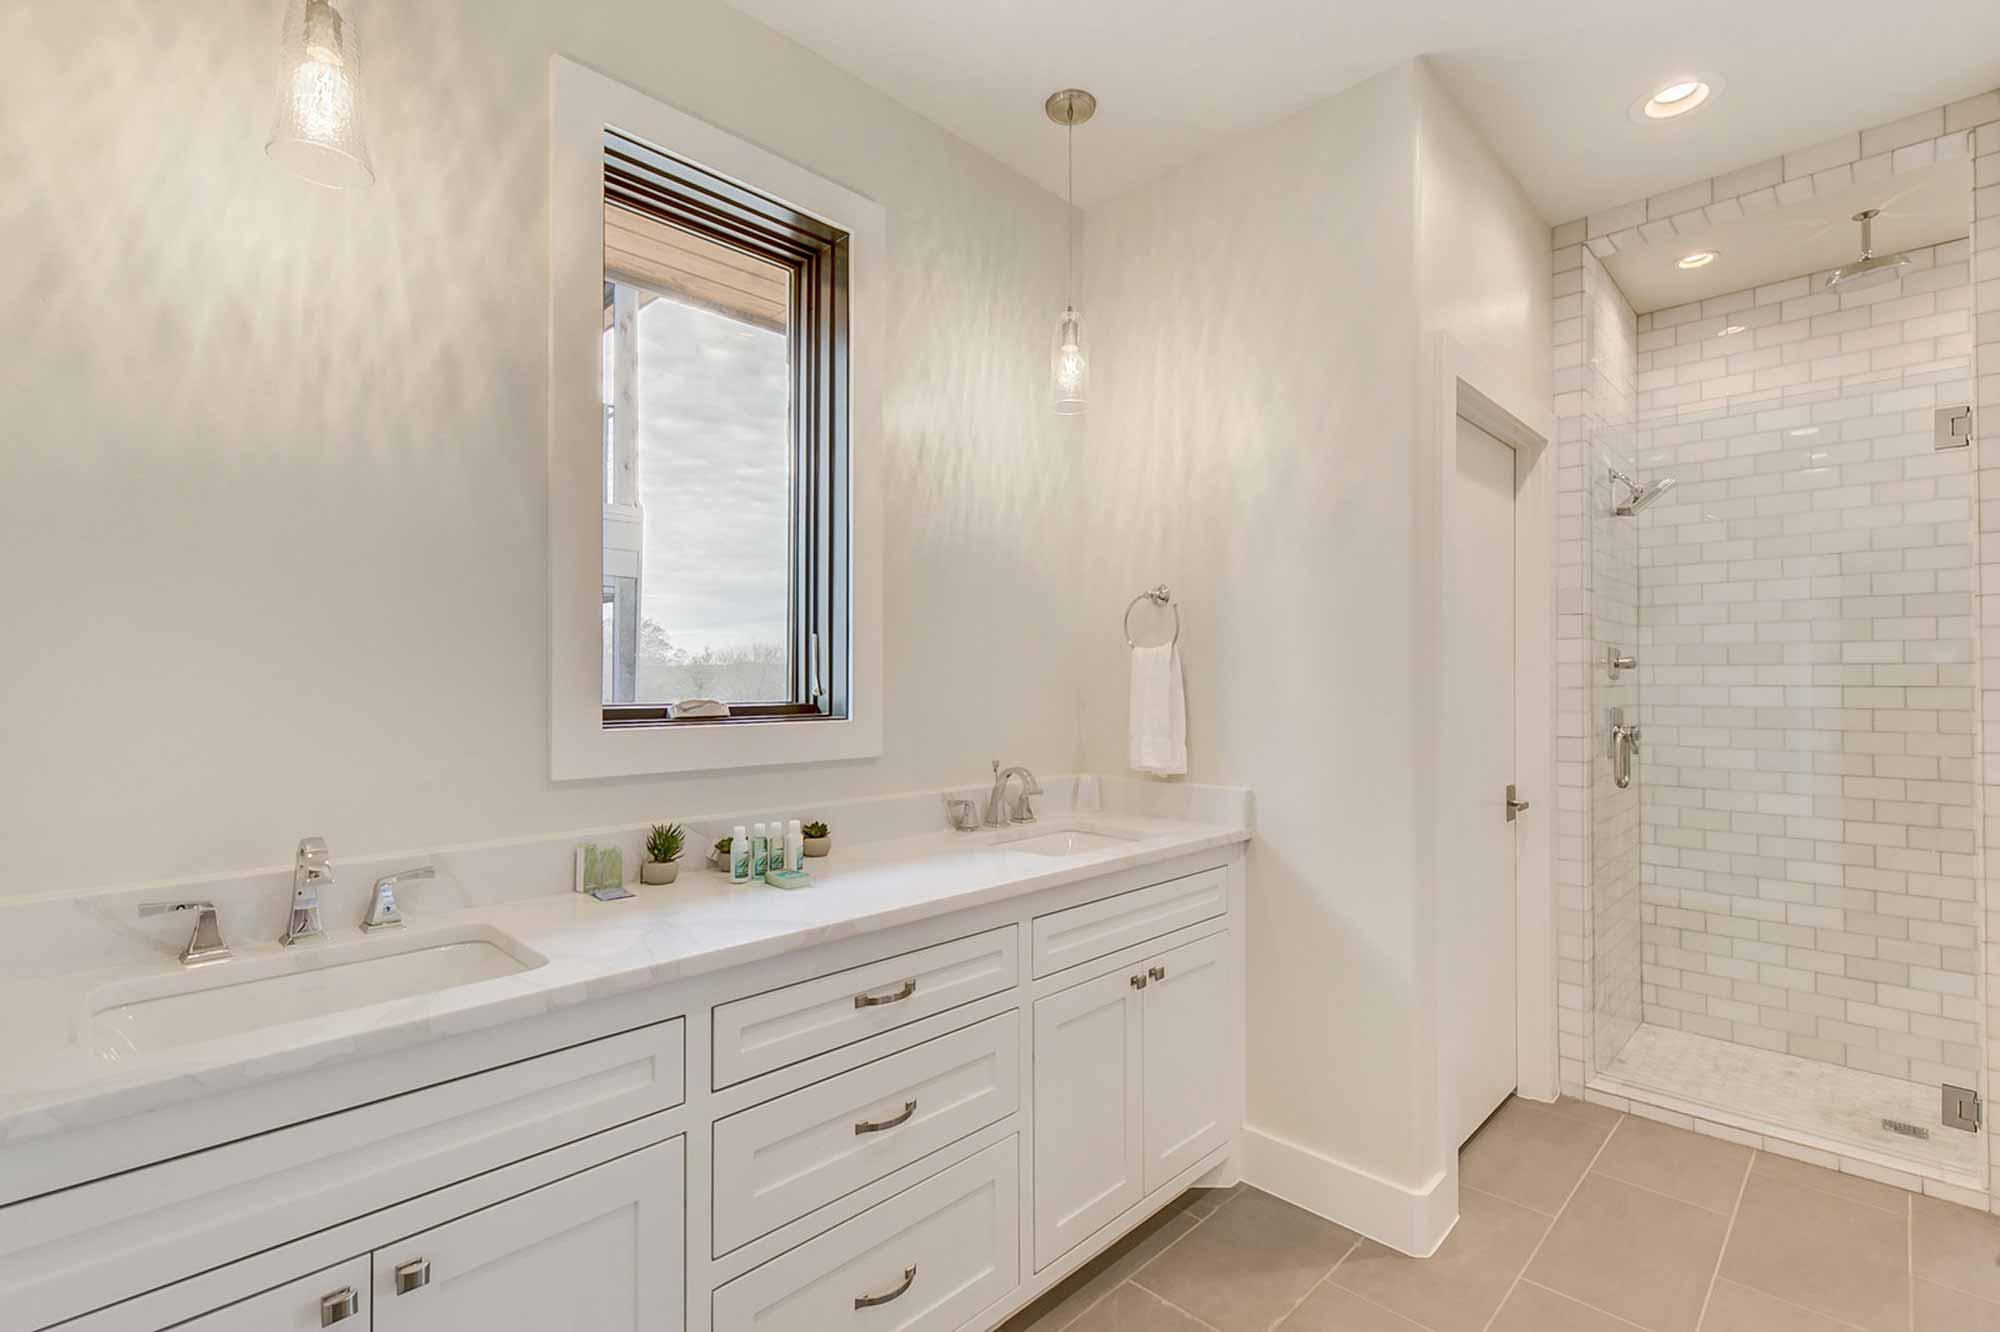 Steve-Bumpas-Custom-Homes-The-Residences-at-Rough-Creek-Lodge-The-Lynn-Lot-15-13-Luxury-Vacation-Properties-Dallas.jpg